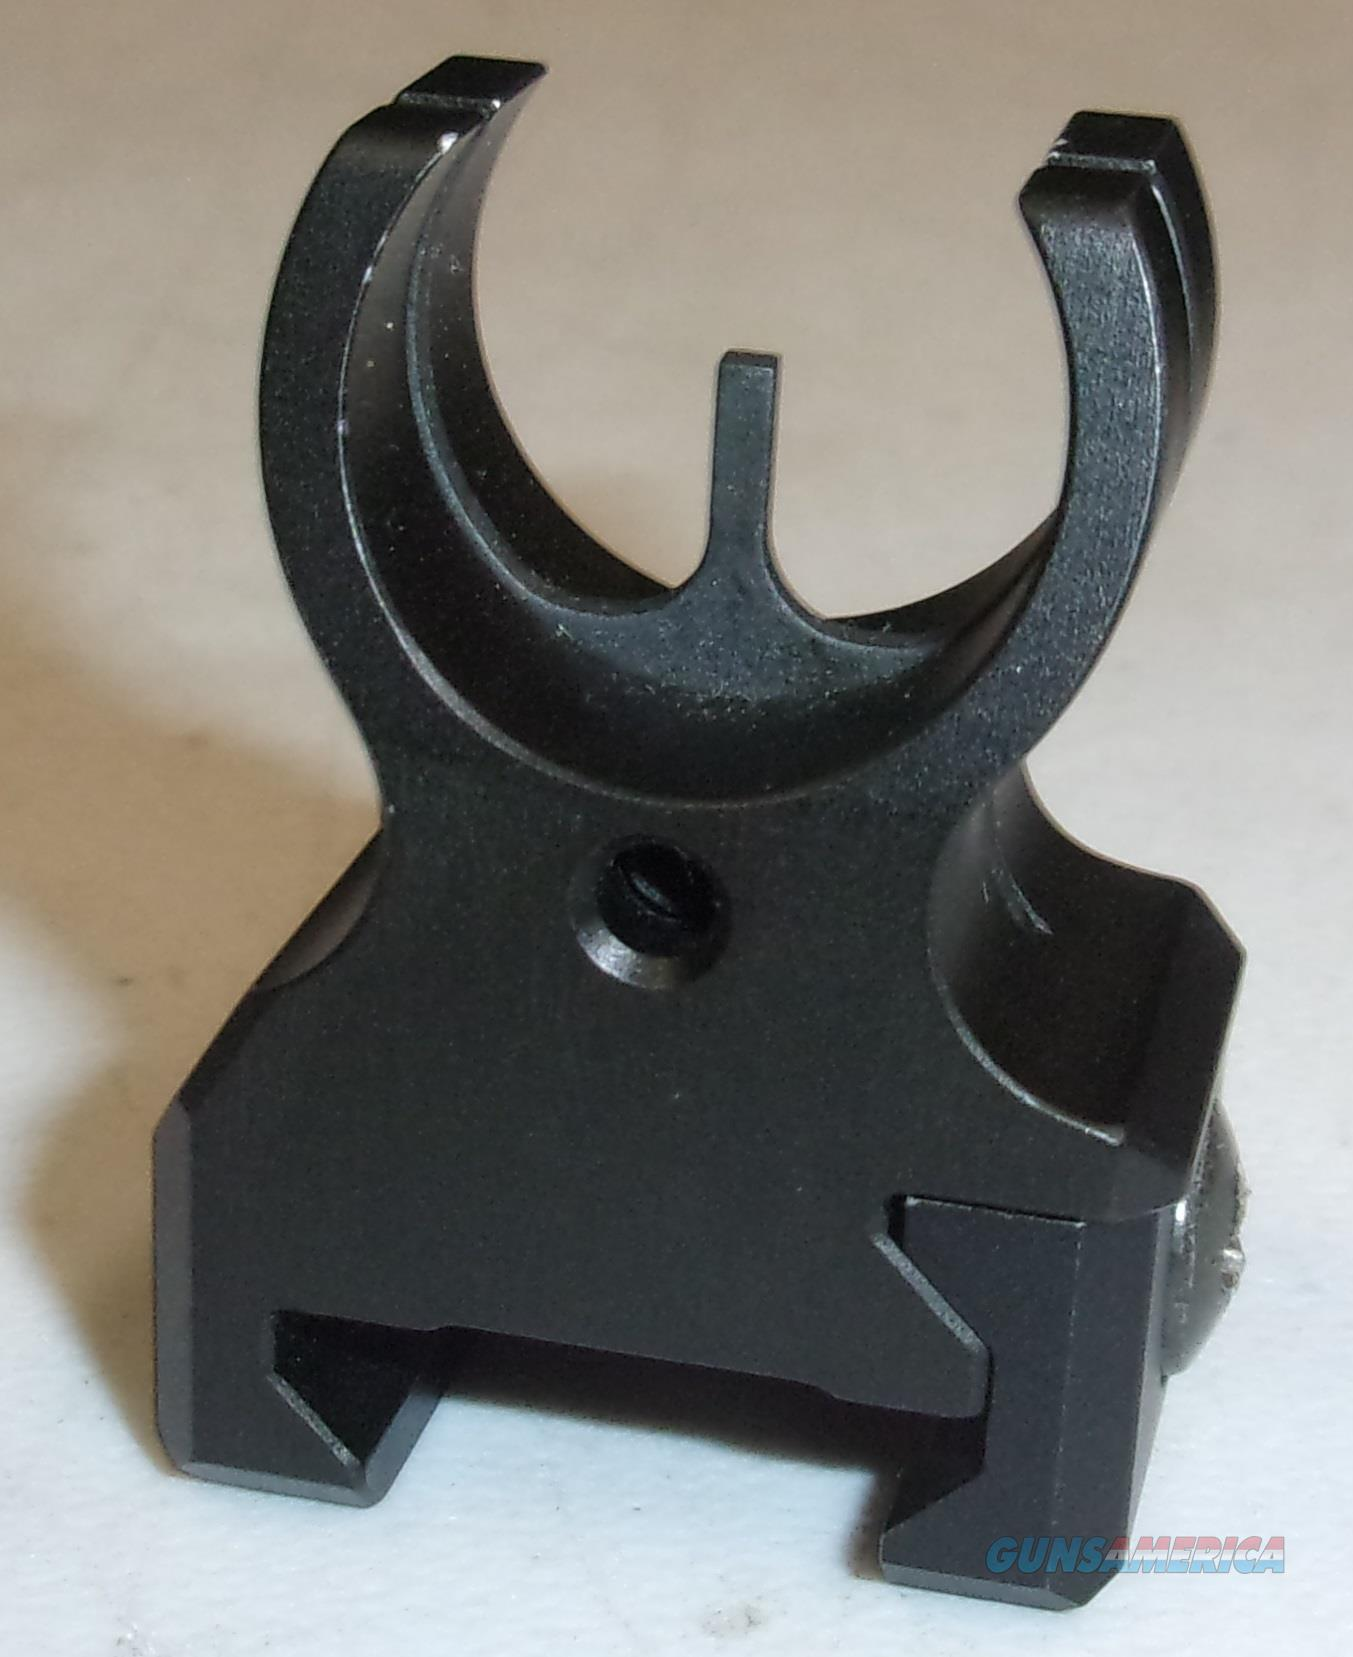 HK 416/MR556 Front Sight  Non-Guns > Iron/Metal/Peep Sights